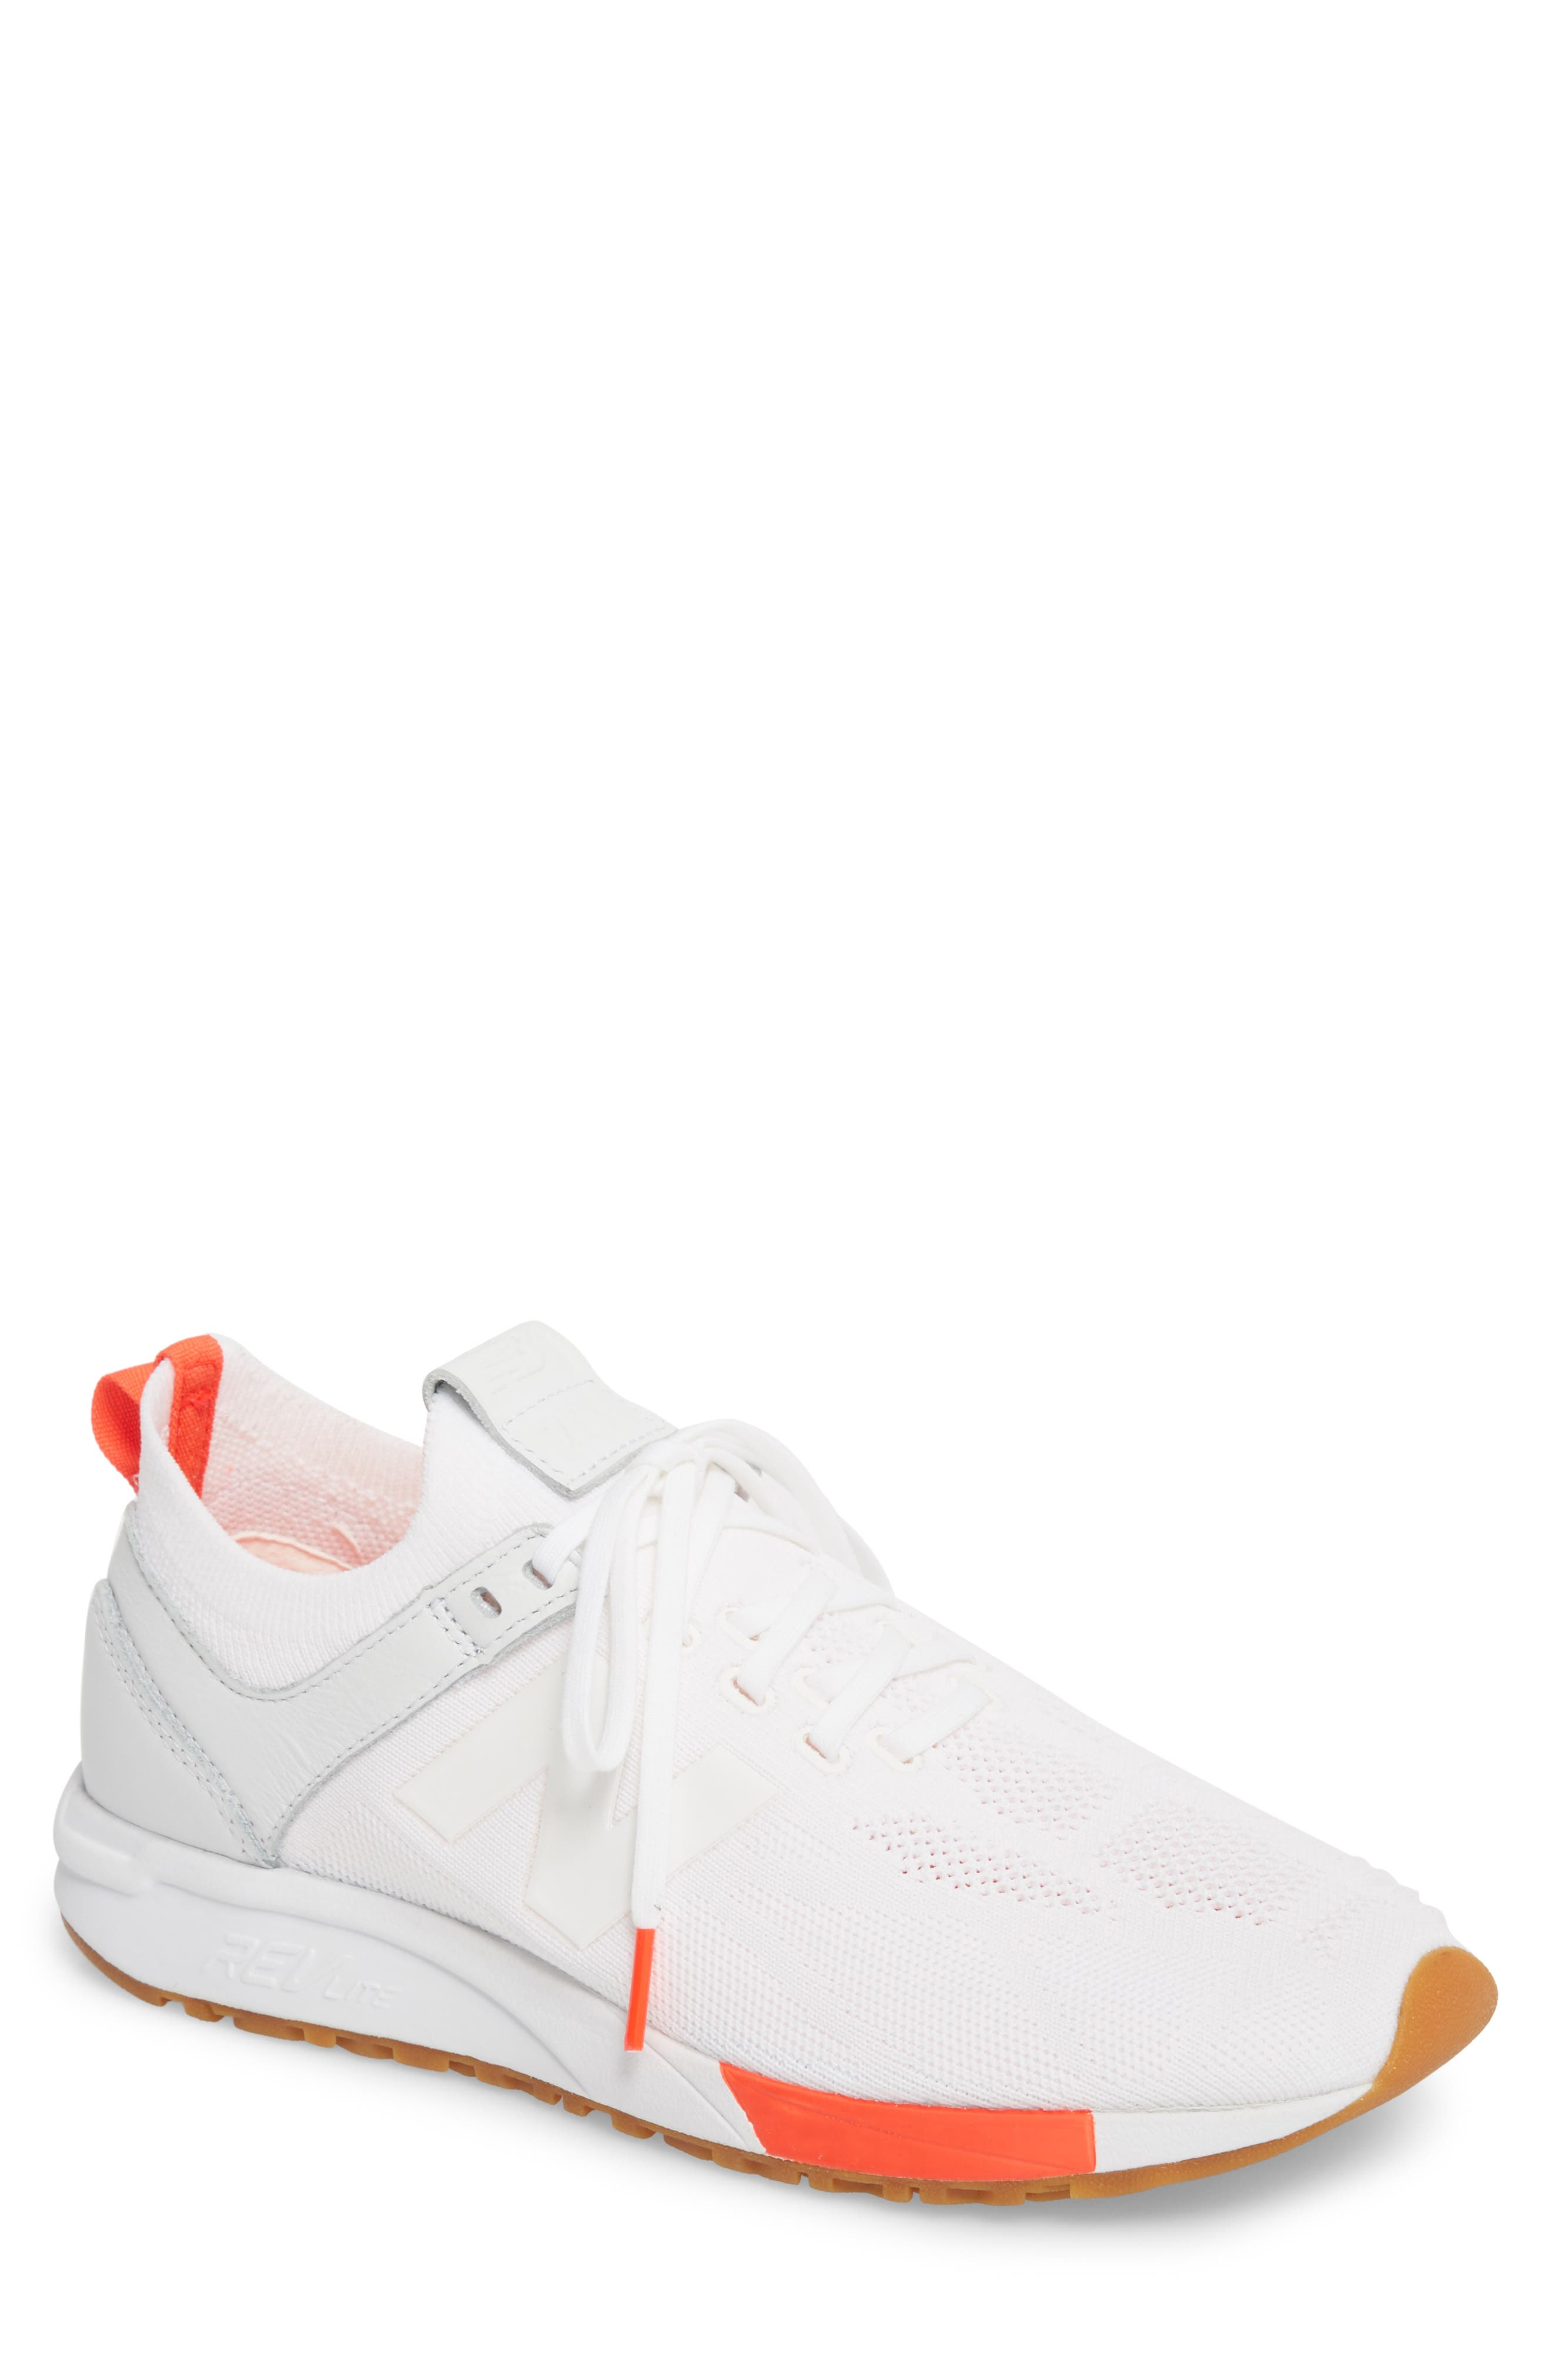 247 Sneaker,                             Main thumbnail 1, color,                             WHITE